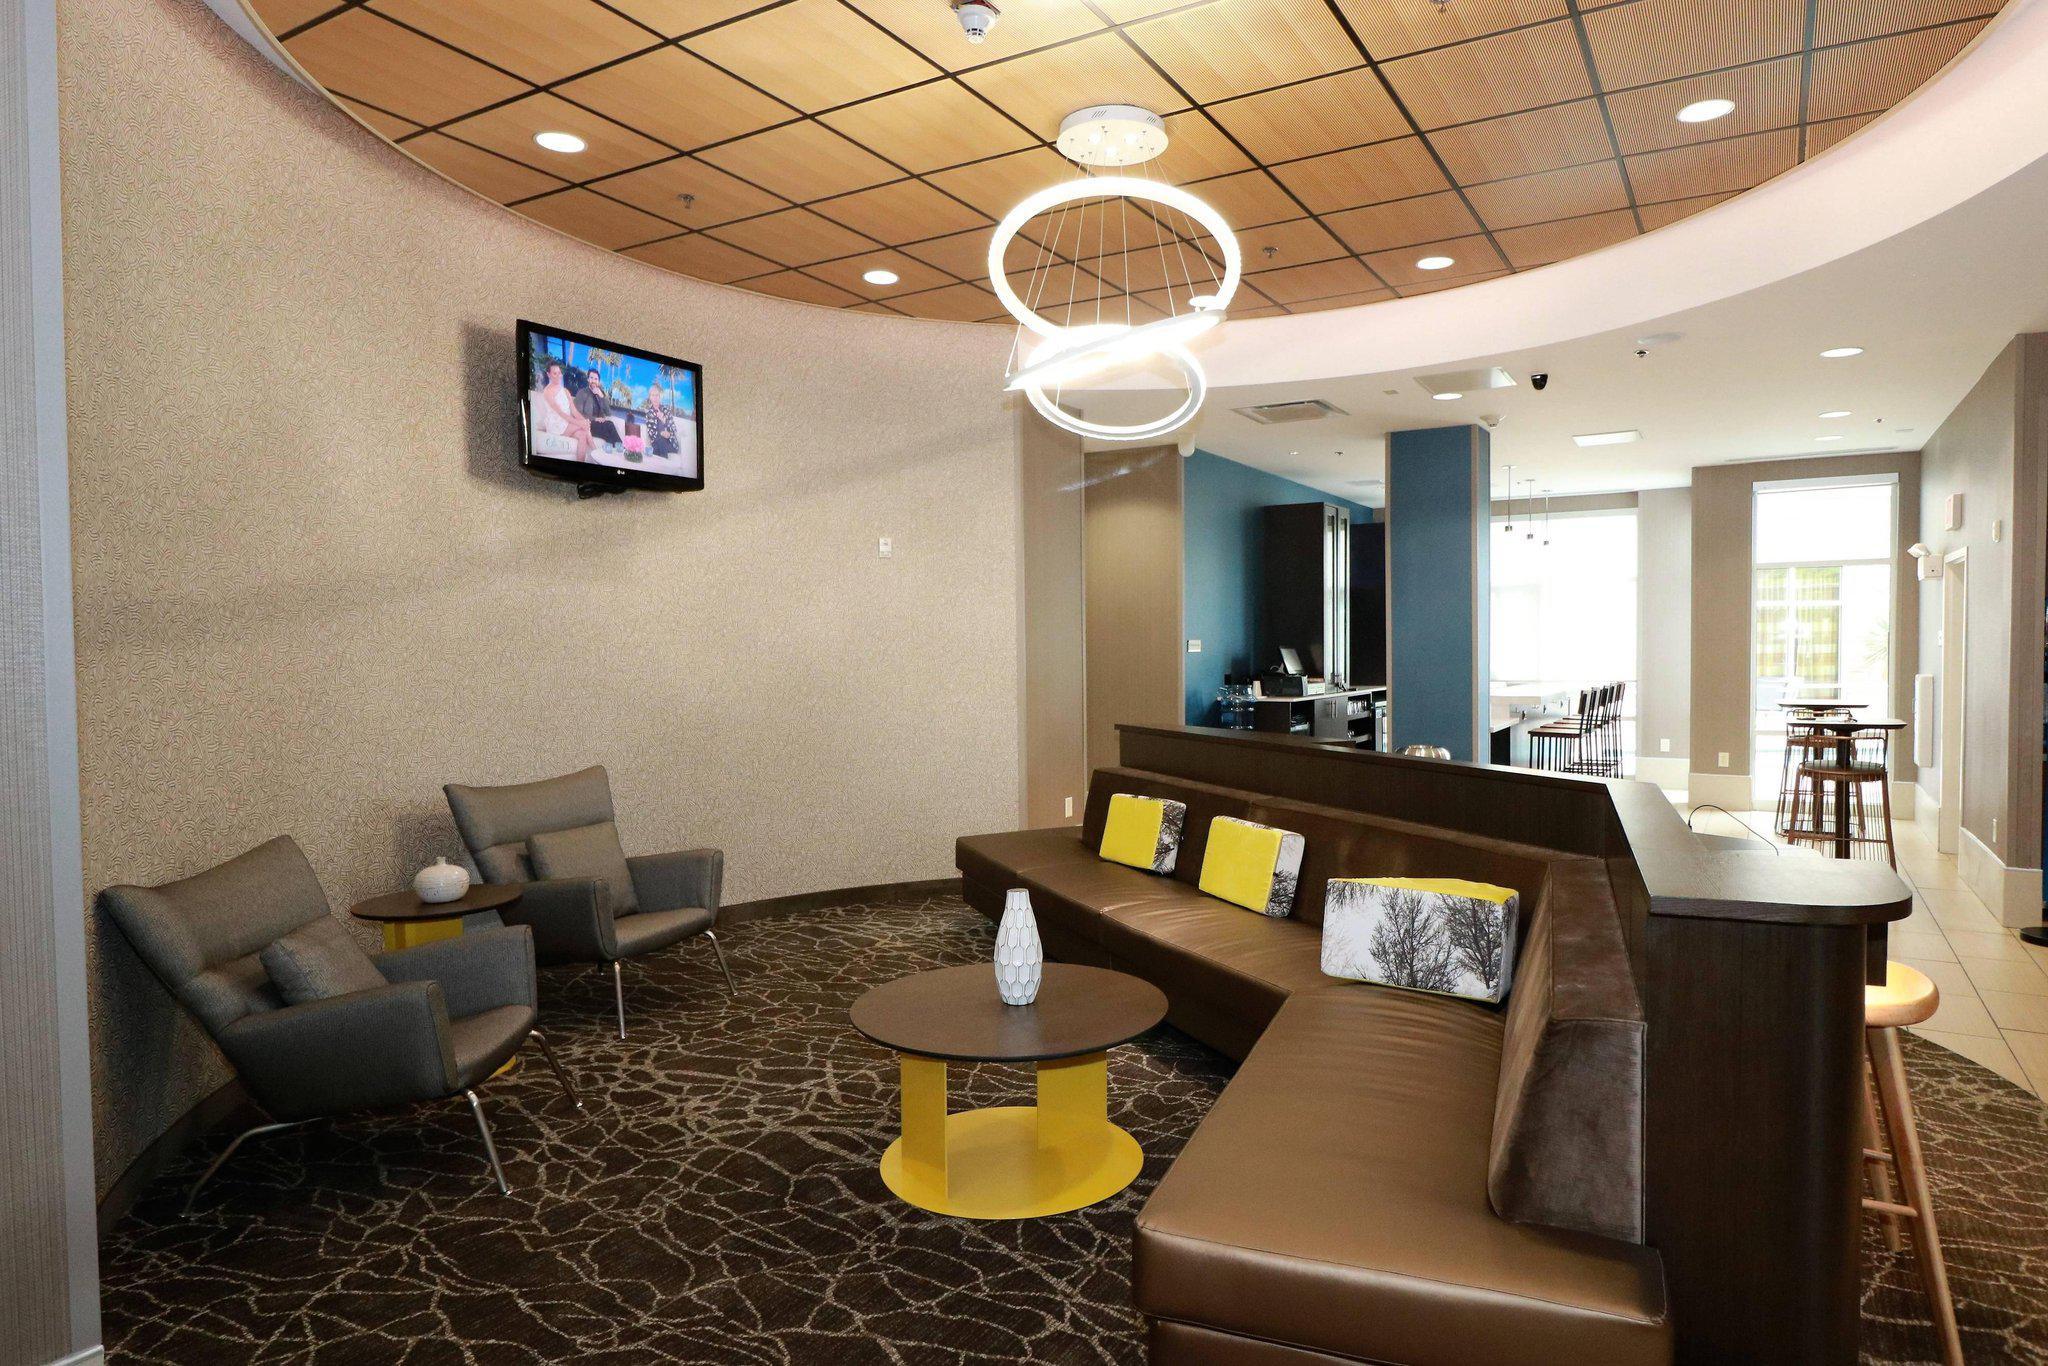 SpringHill Suites by Marriott San Antonio Alamo Plaza/Convention Center